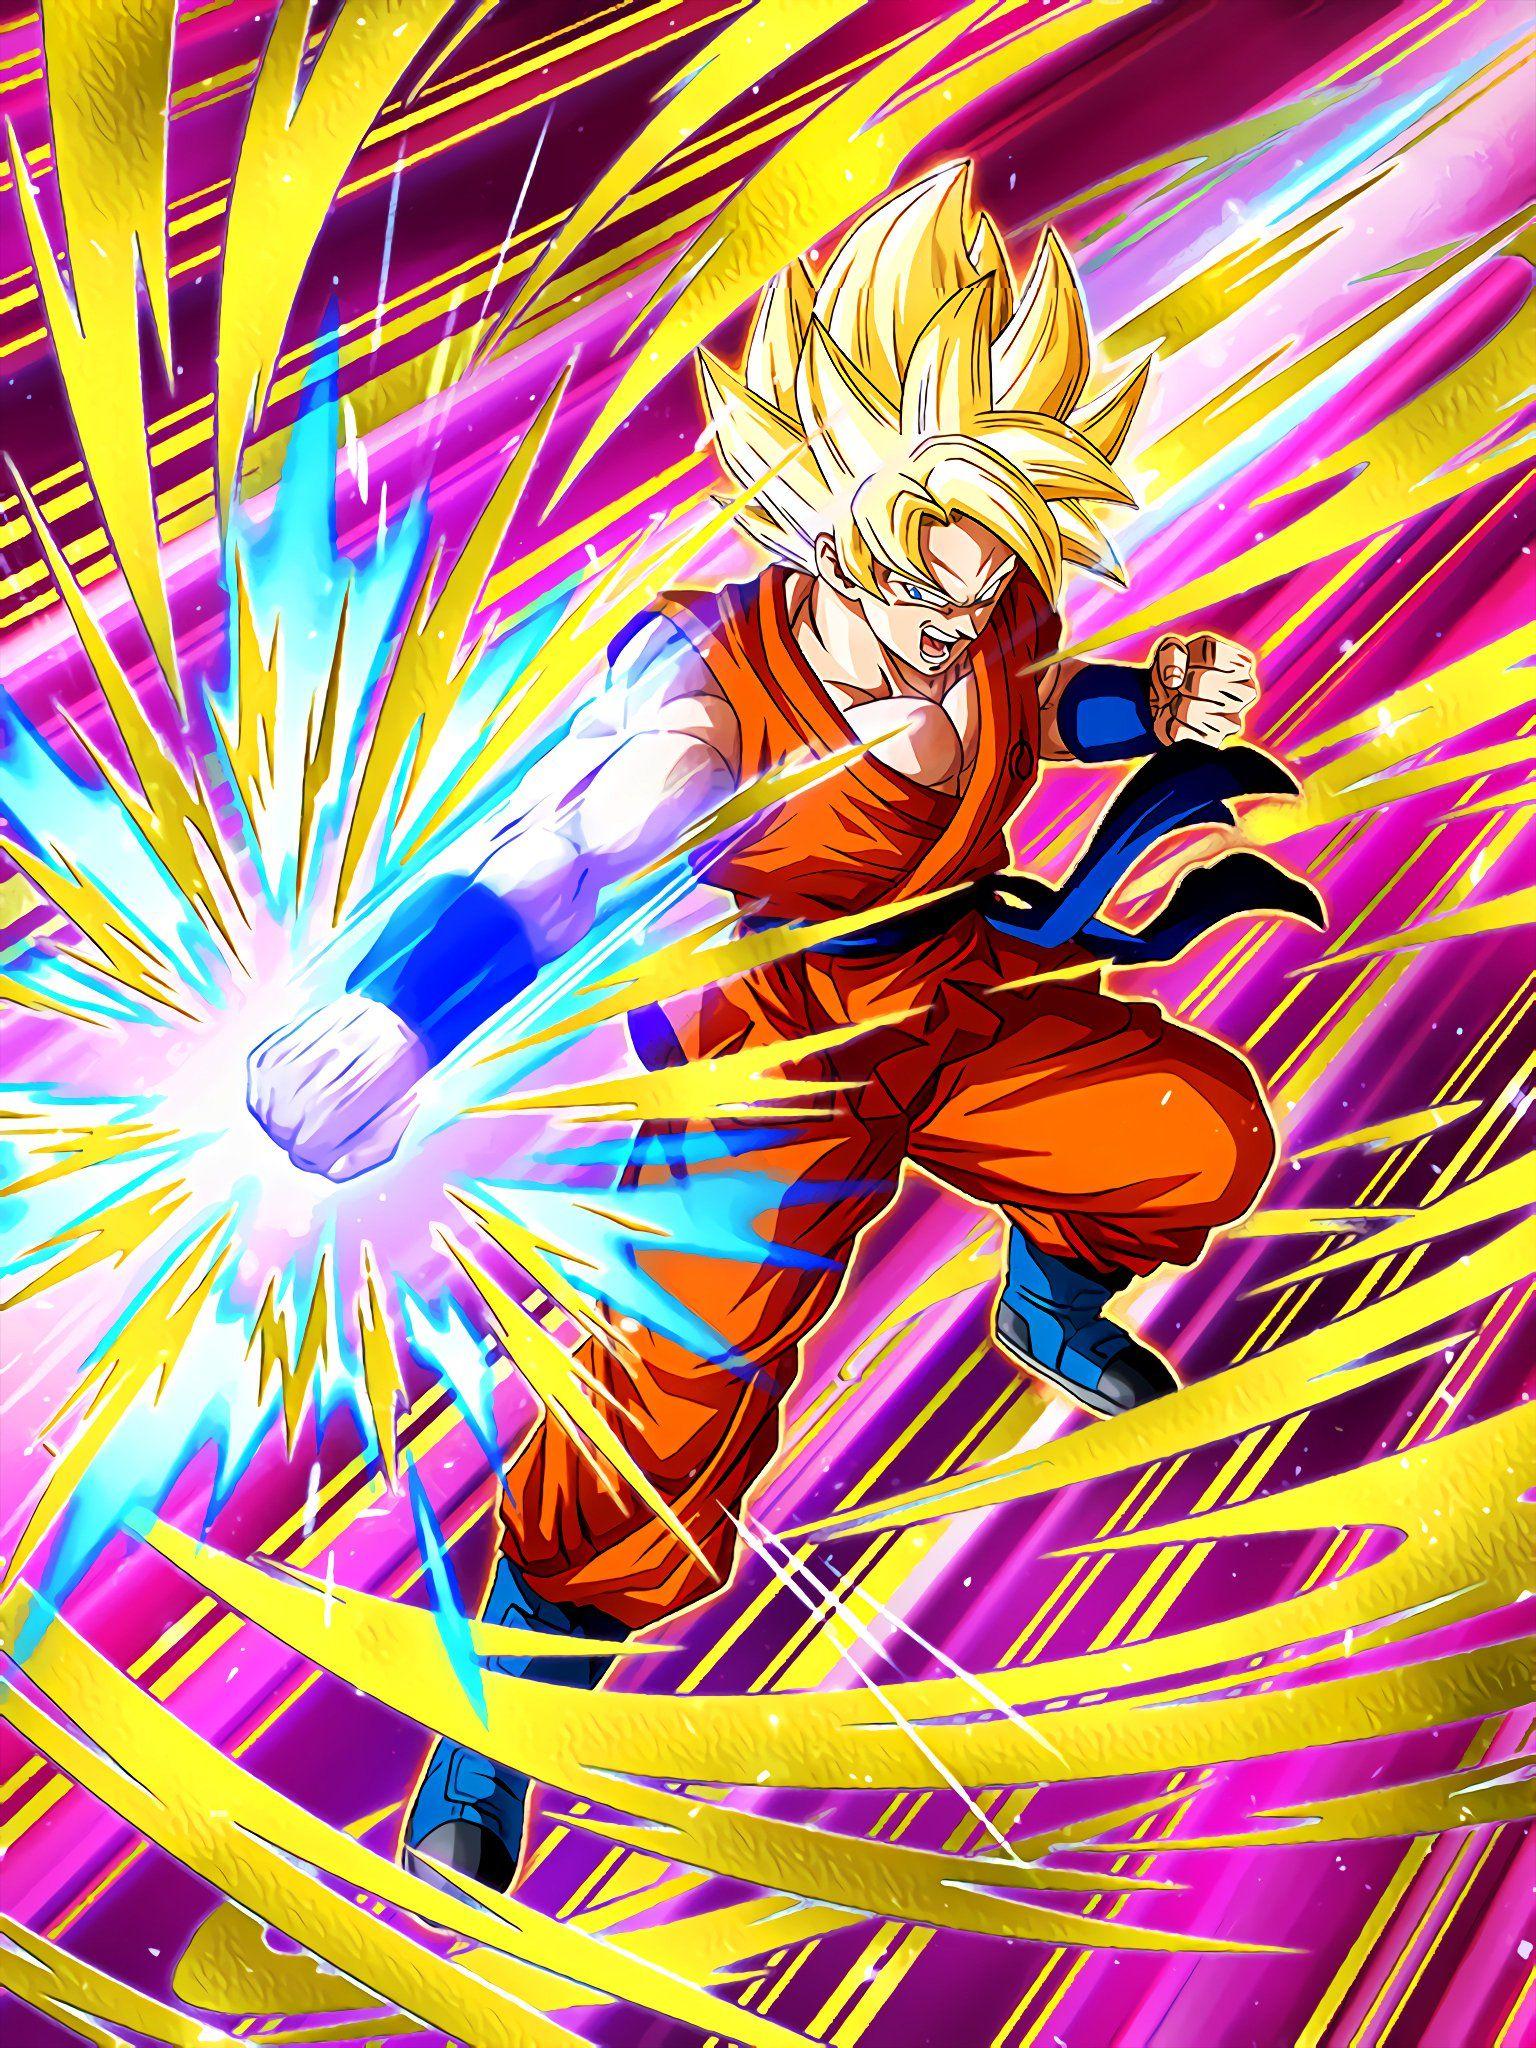 Hydros On Twitter Dragon Ball Art Goku Dragon Ball Super